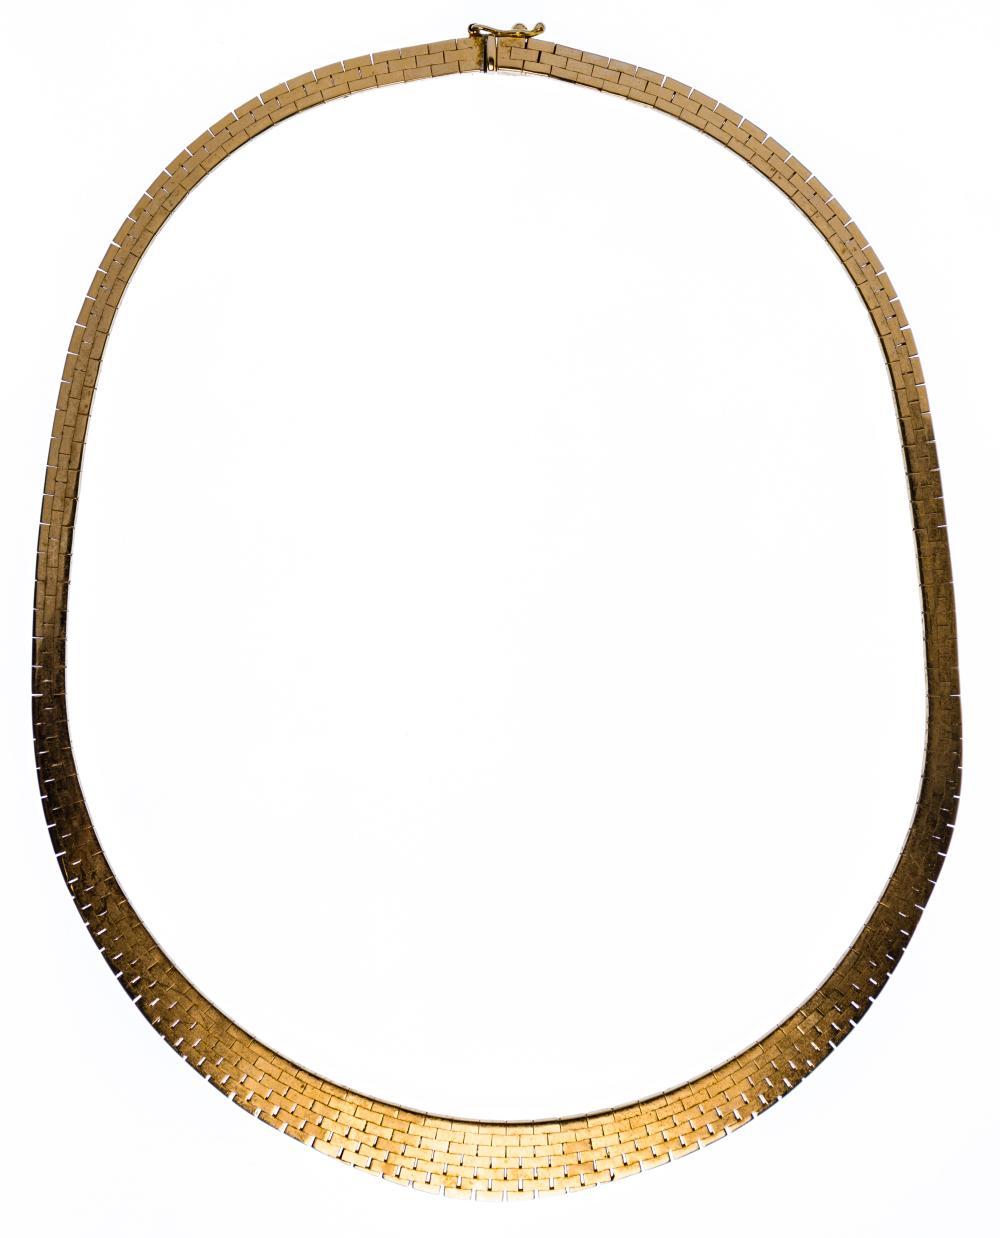 14k Yellow Gold Brushed Choker Necklace